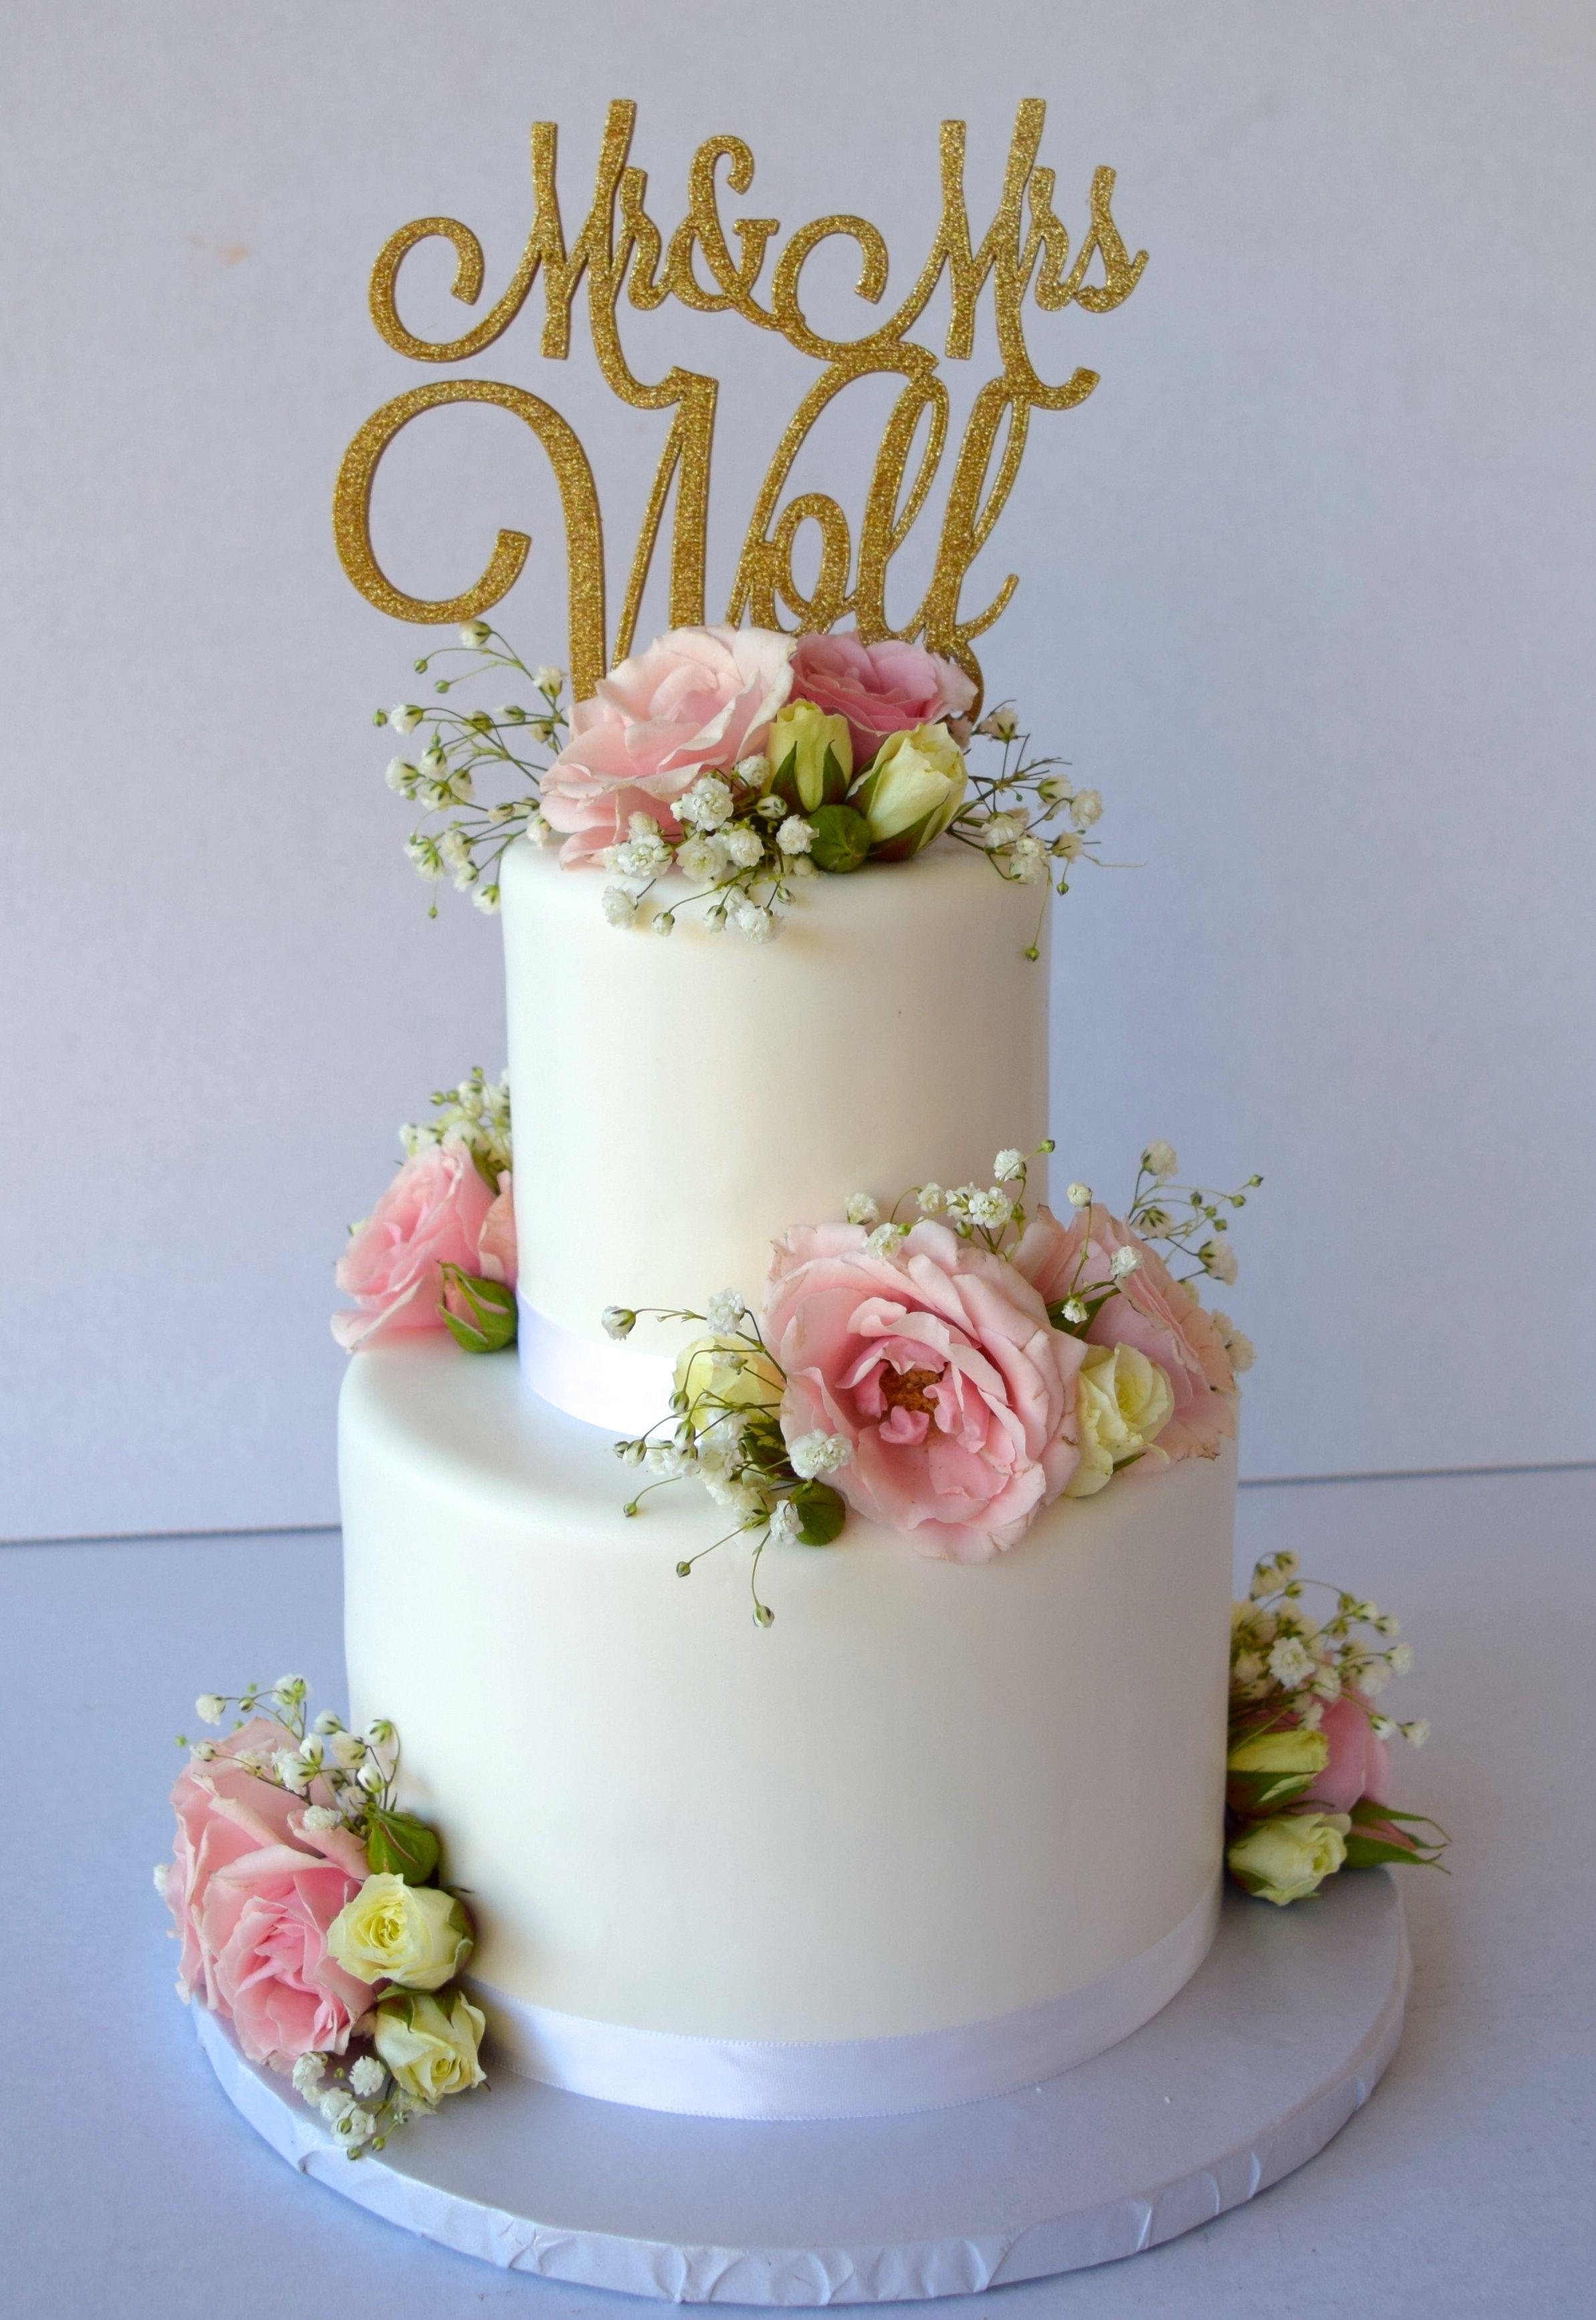 2 tier white wedding cake with blush pink roses on each tier and 2 tier white wedding cake with blush pink roses on each tier and babys breath on junglespirit Choice Image